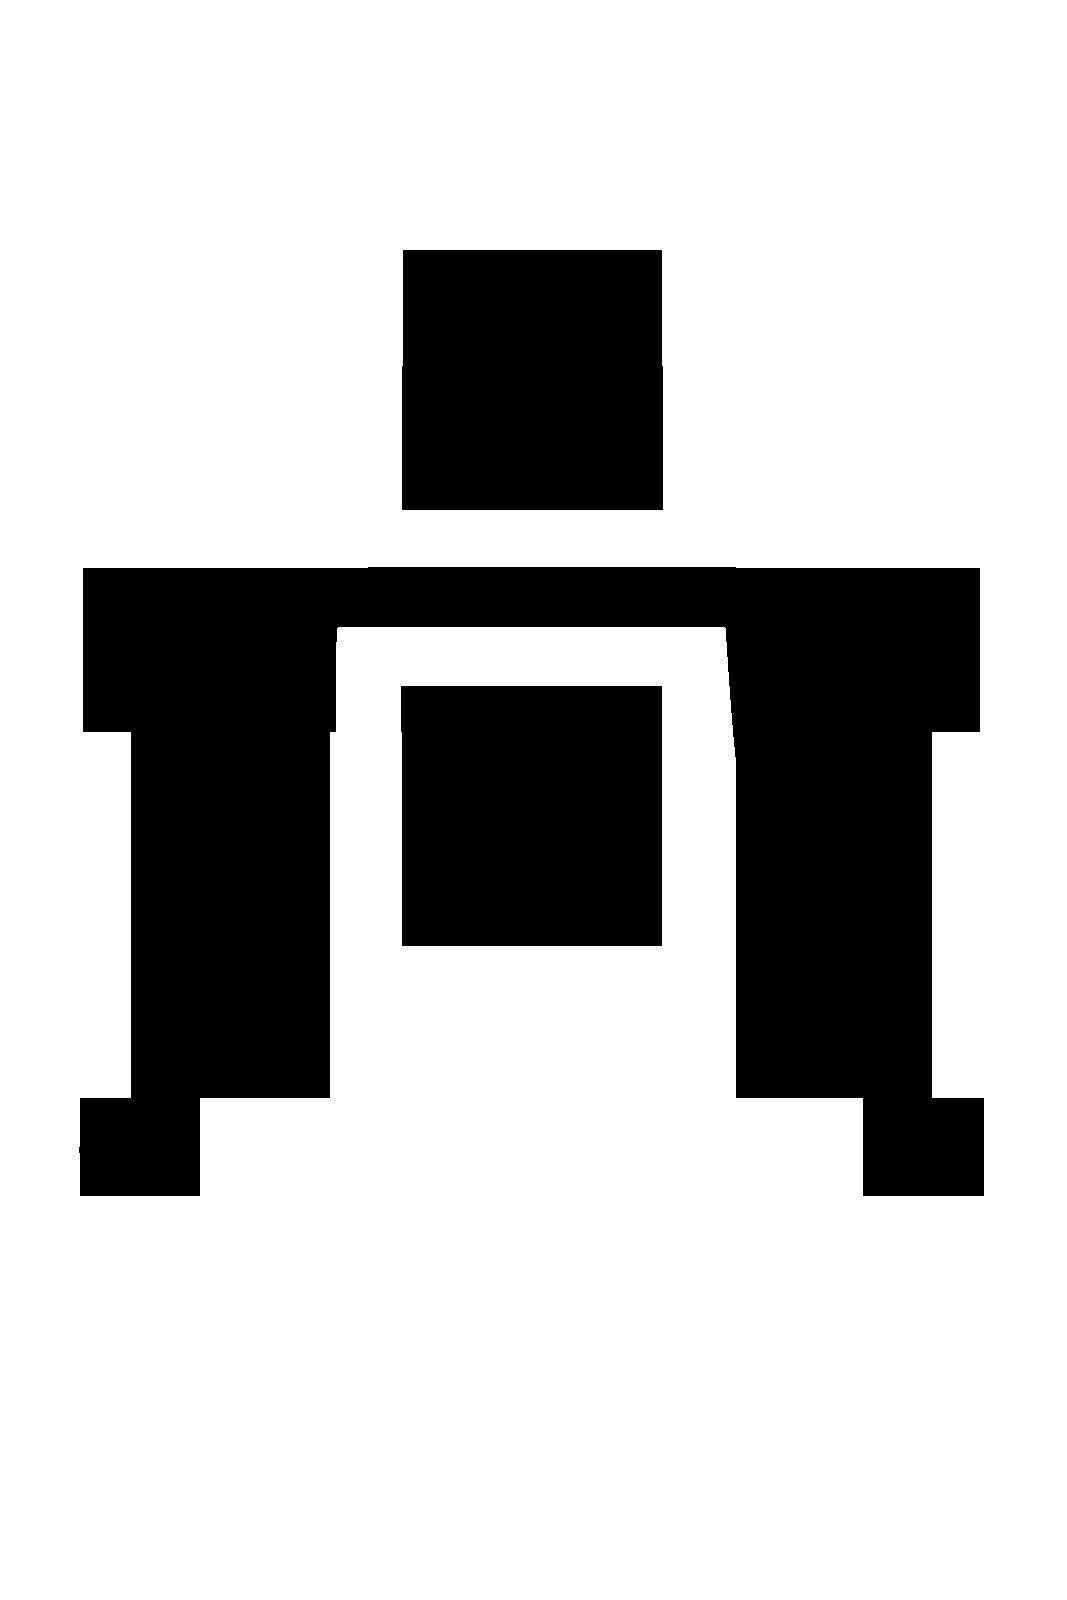 File symbol png wikimedia. Planet clipart haumea